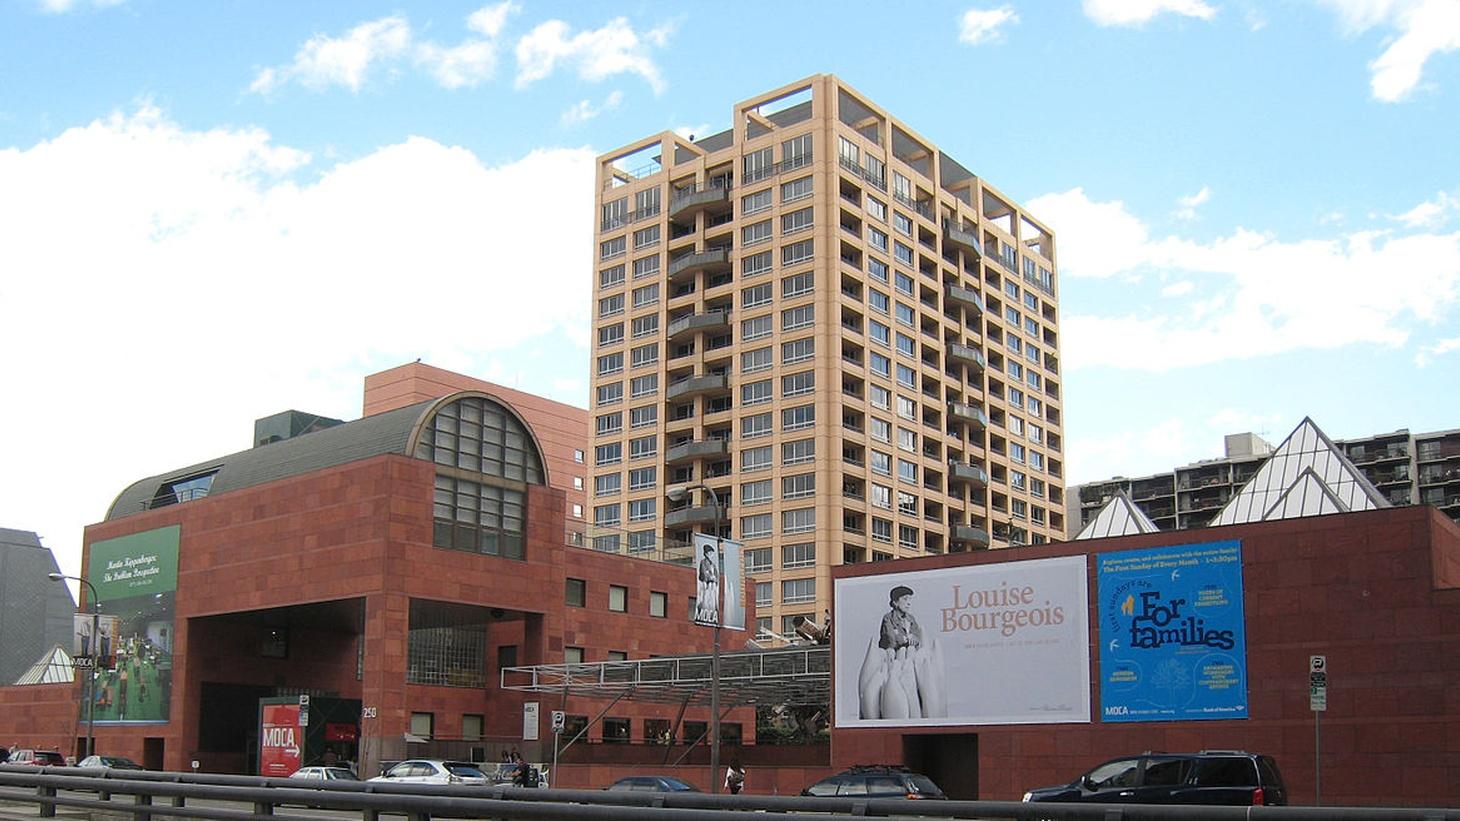 Museum of Contemporary Art (MOCA) in downtown Los Angeles, California.